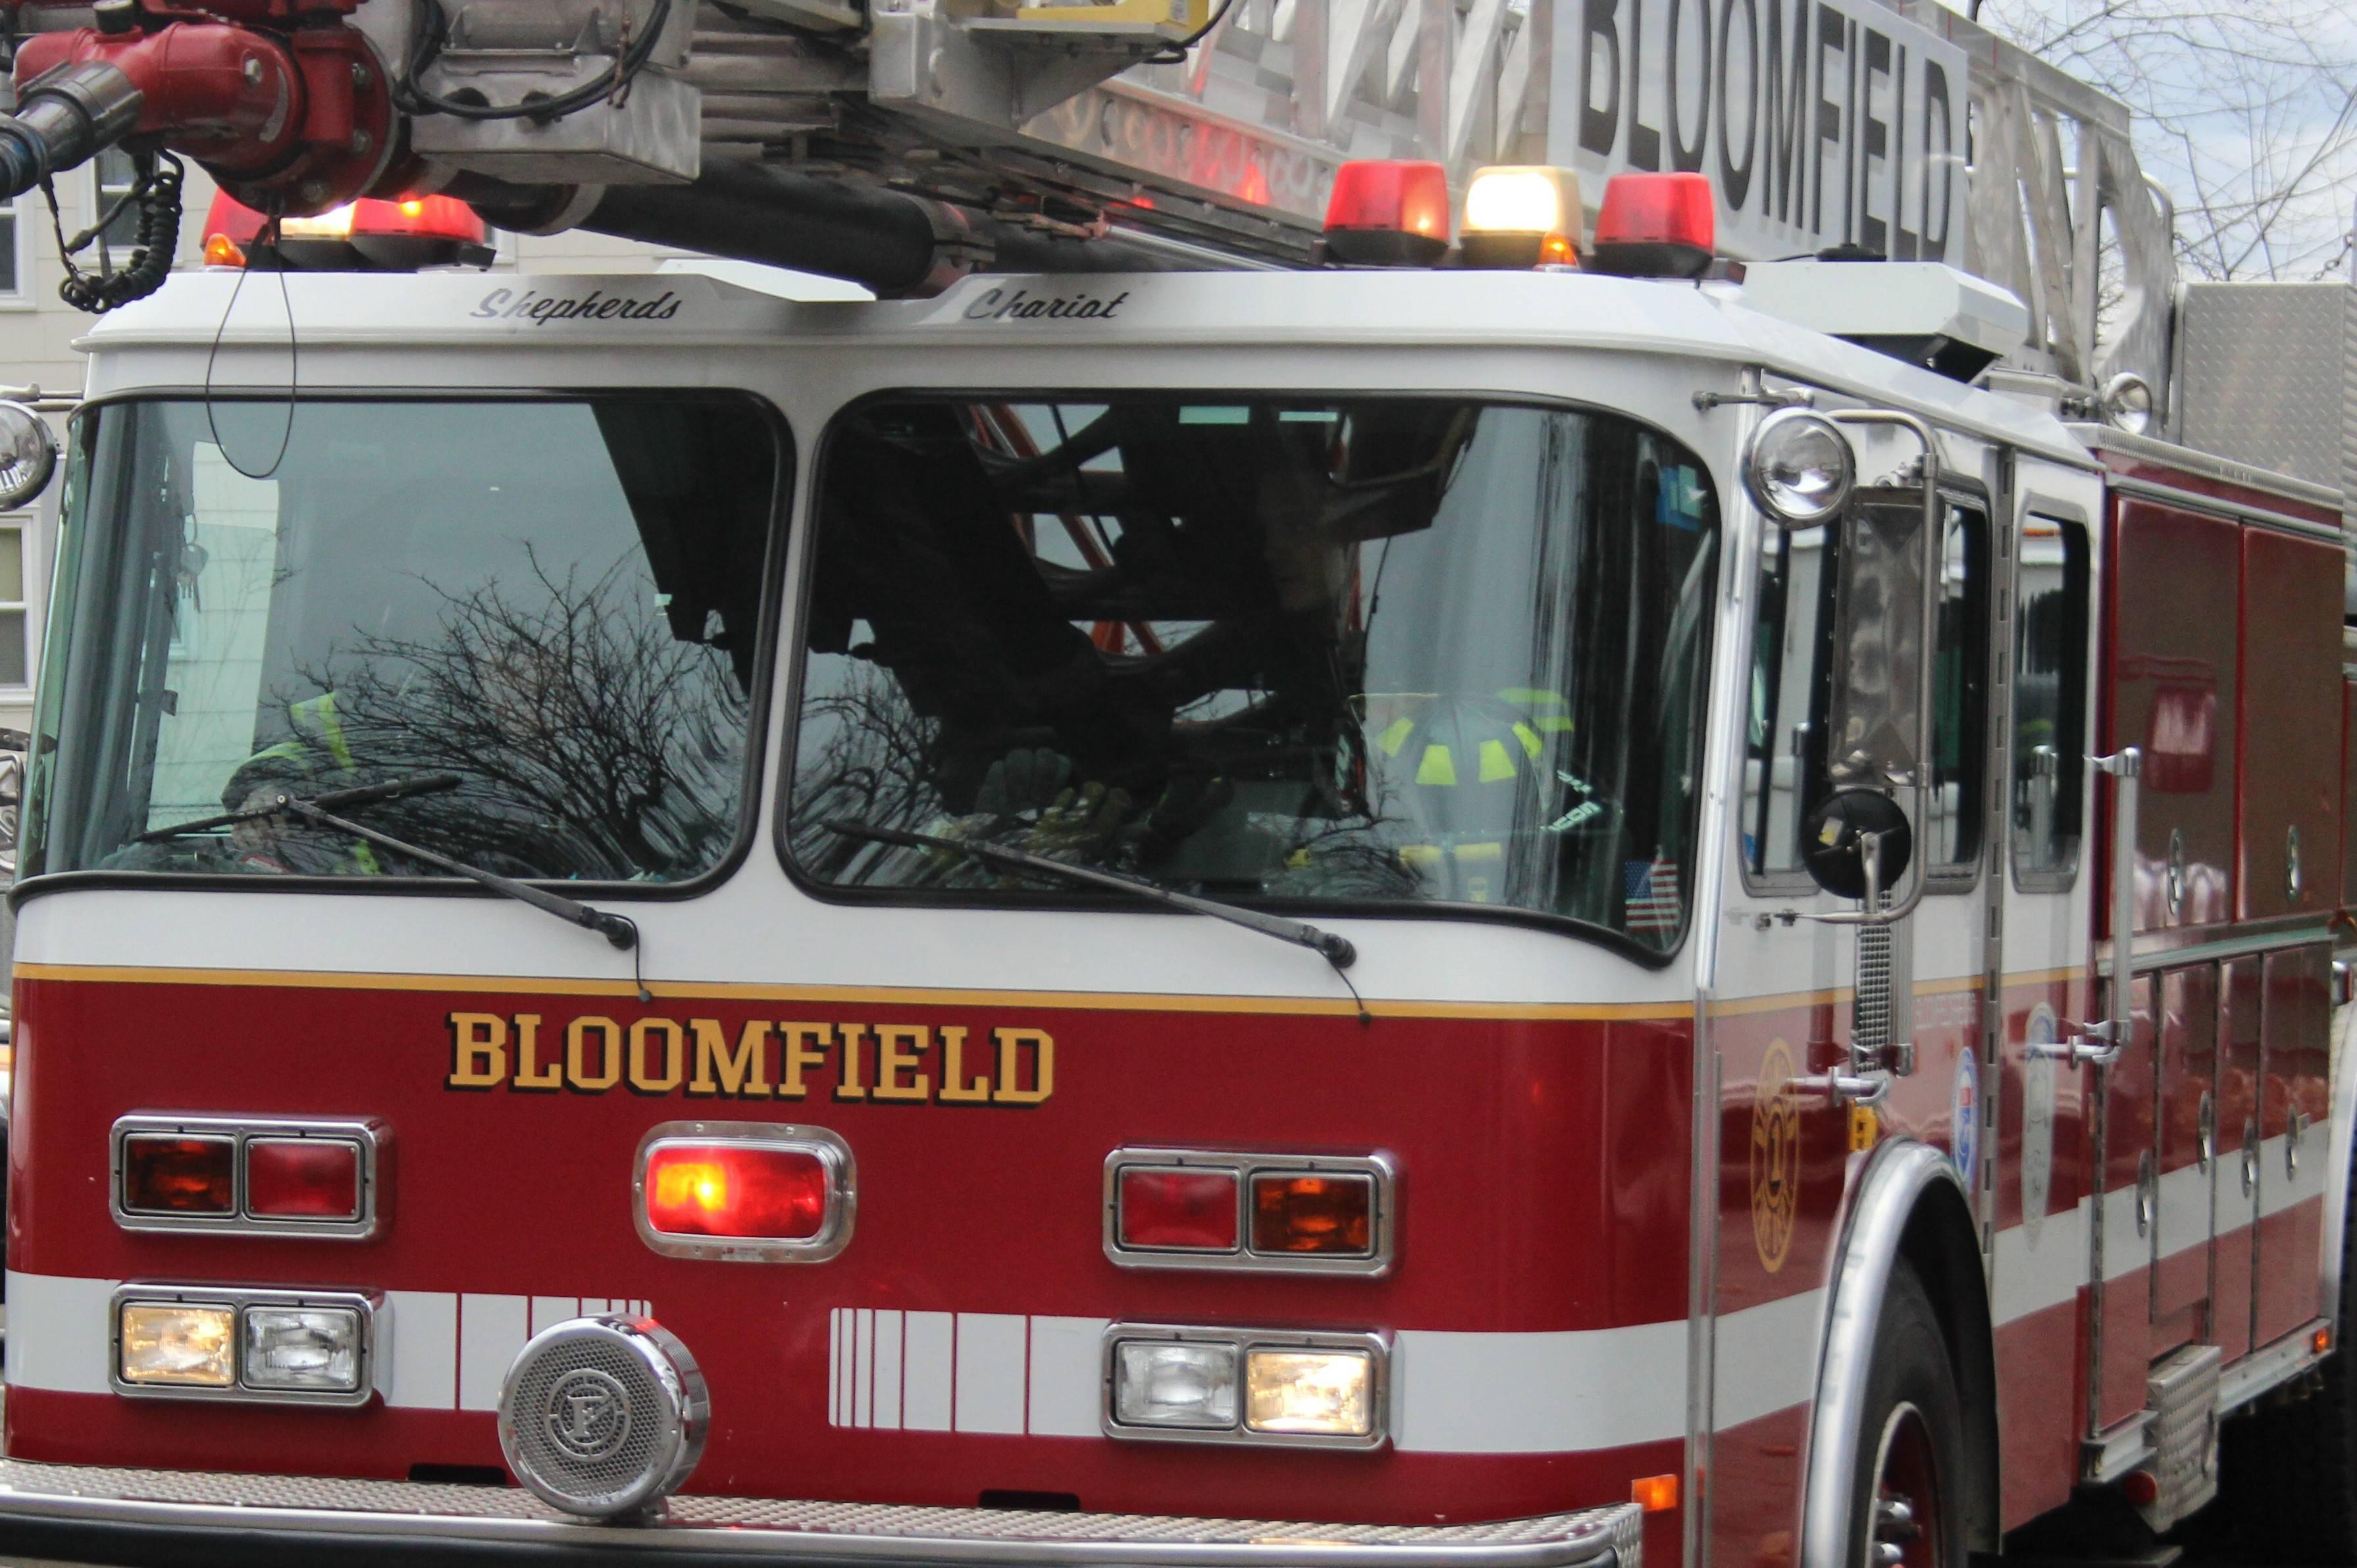 9f668ffefe8490a69701_best_bac220fe69eae9ef9901_Nissan_Murano_Bloomfield_Fire_Department_Training_027.jpg